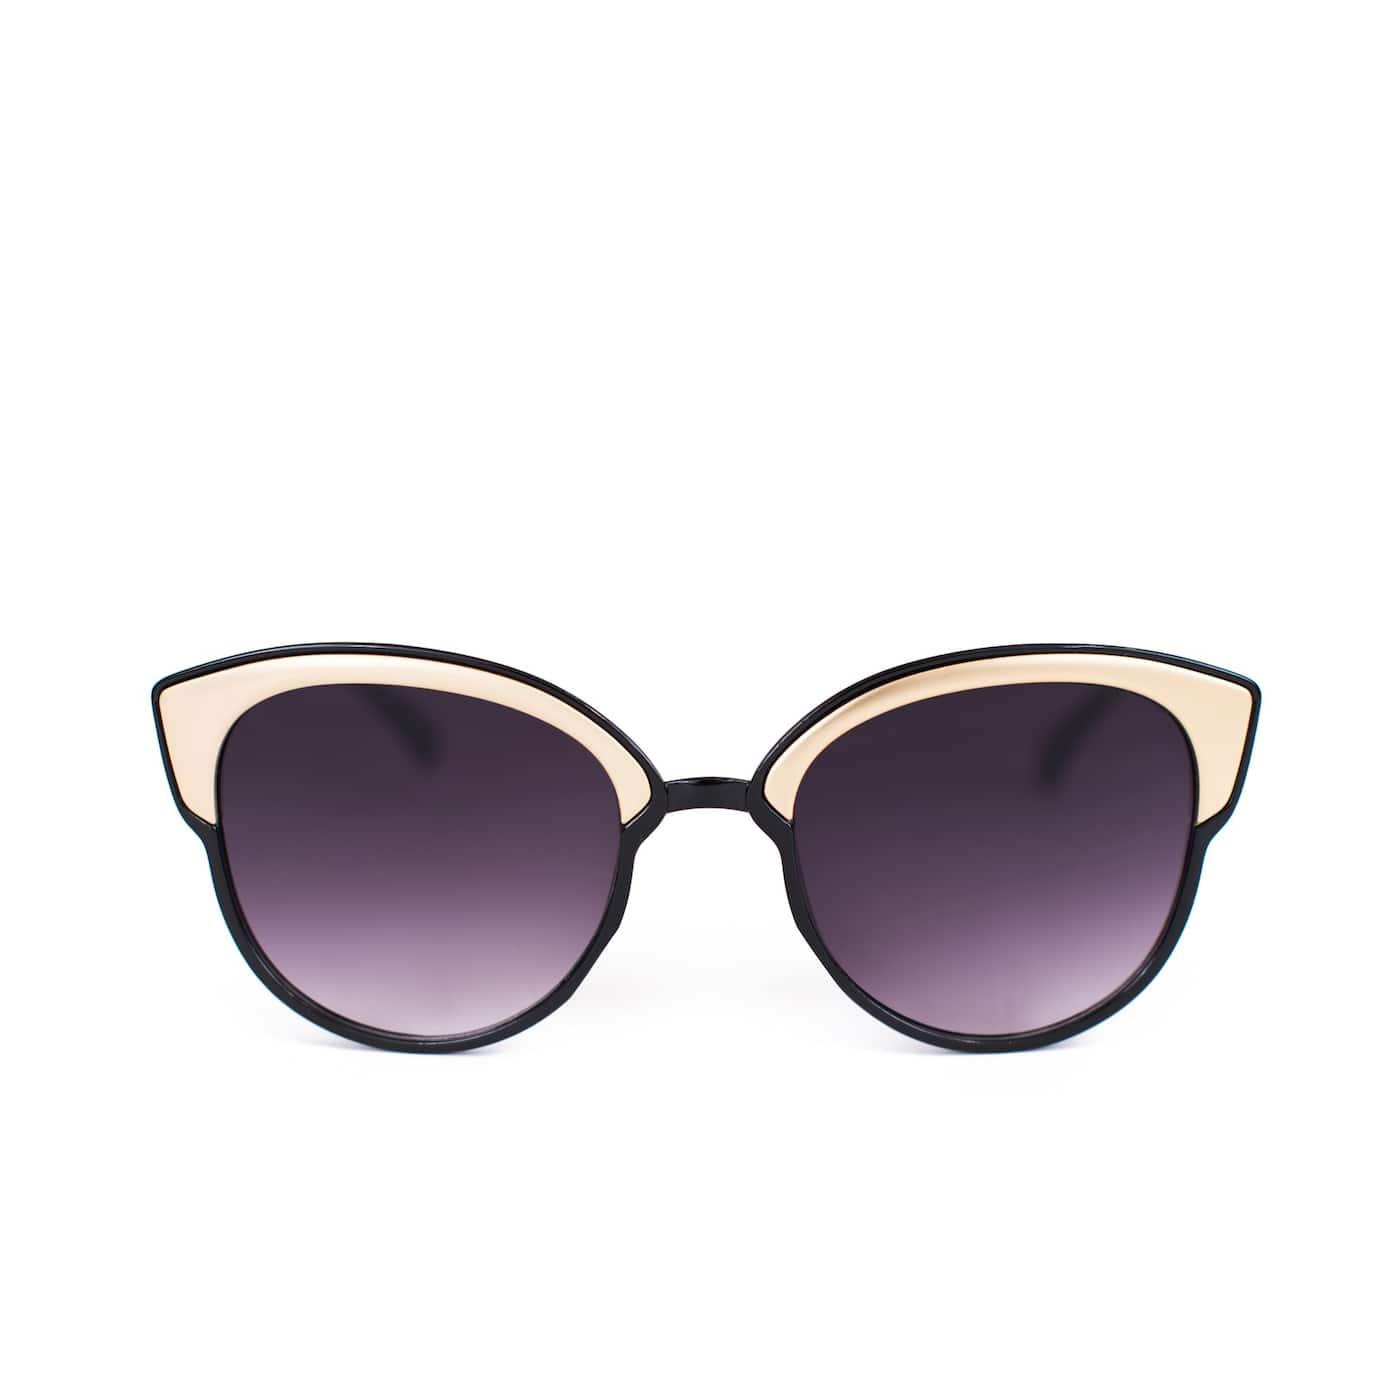 Art Of Polo Woman's Sunglasses ok19188